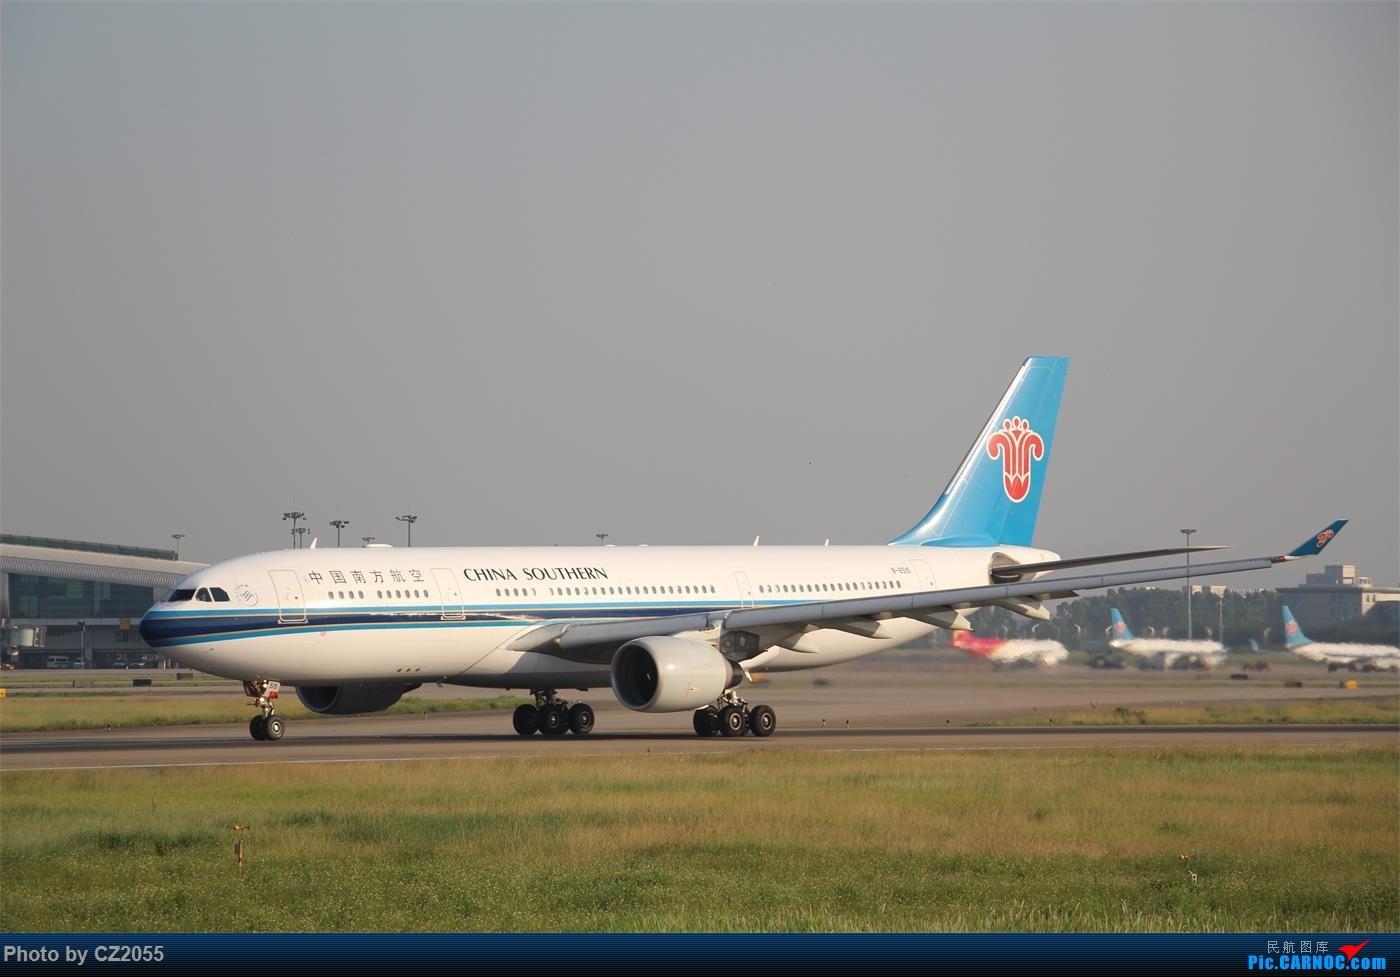 Re:[原创]【广东青少年拍机小队】【C-Z-2055】2015即将结束,来做个总结。 AIRBUS A330-200 B-6515 中国广州白云国际机场